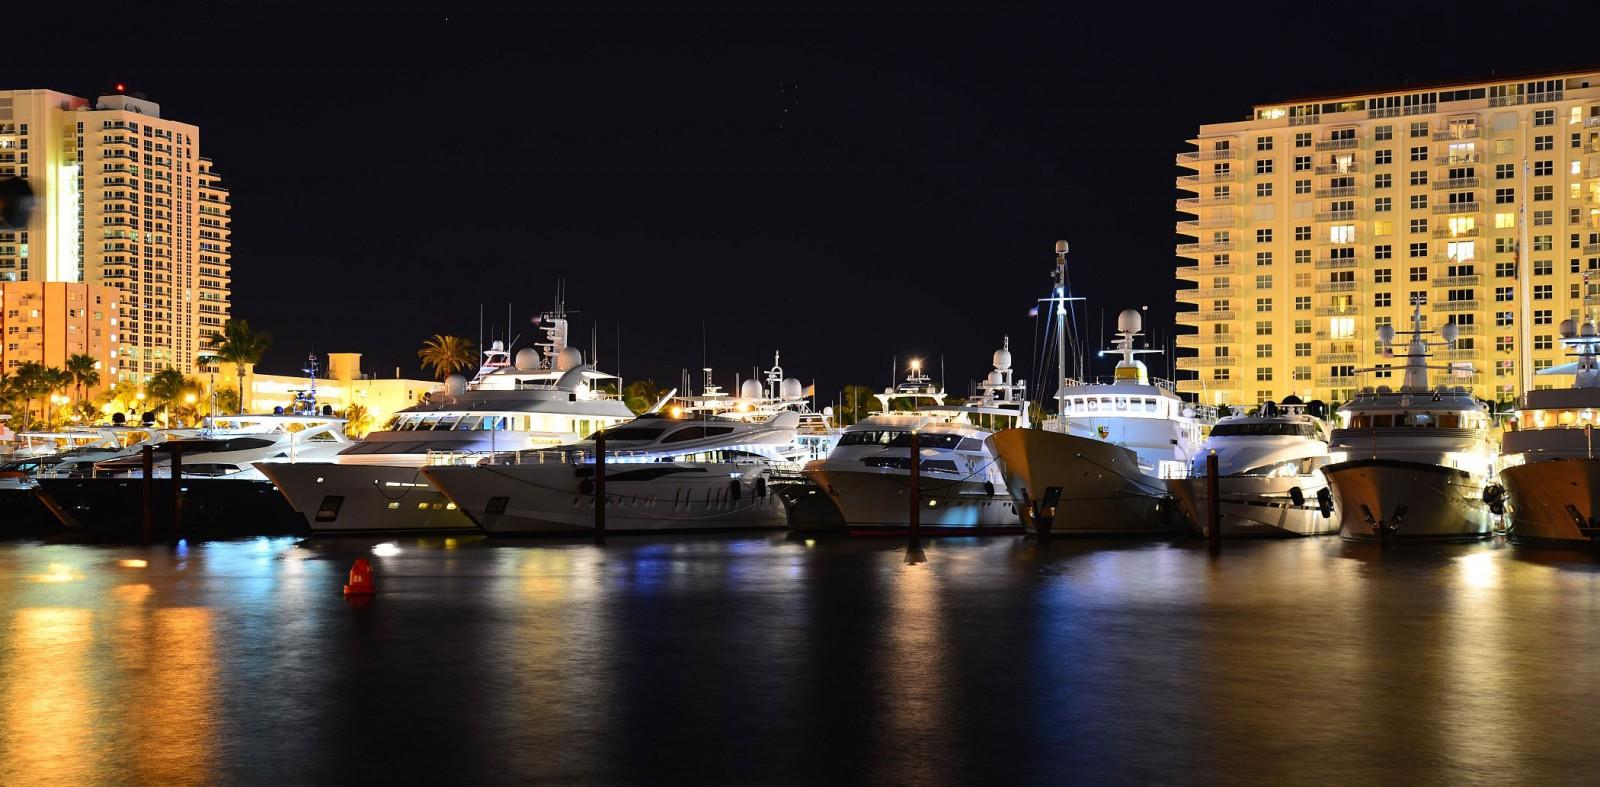 STOCK-8-white-yachts-yellow FLIBS